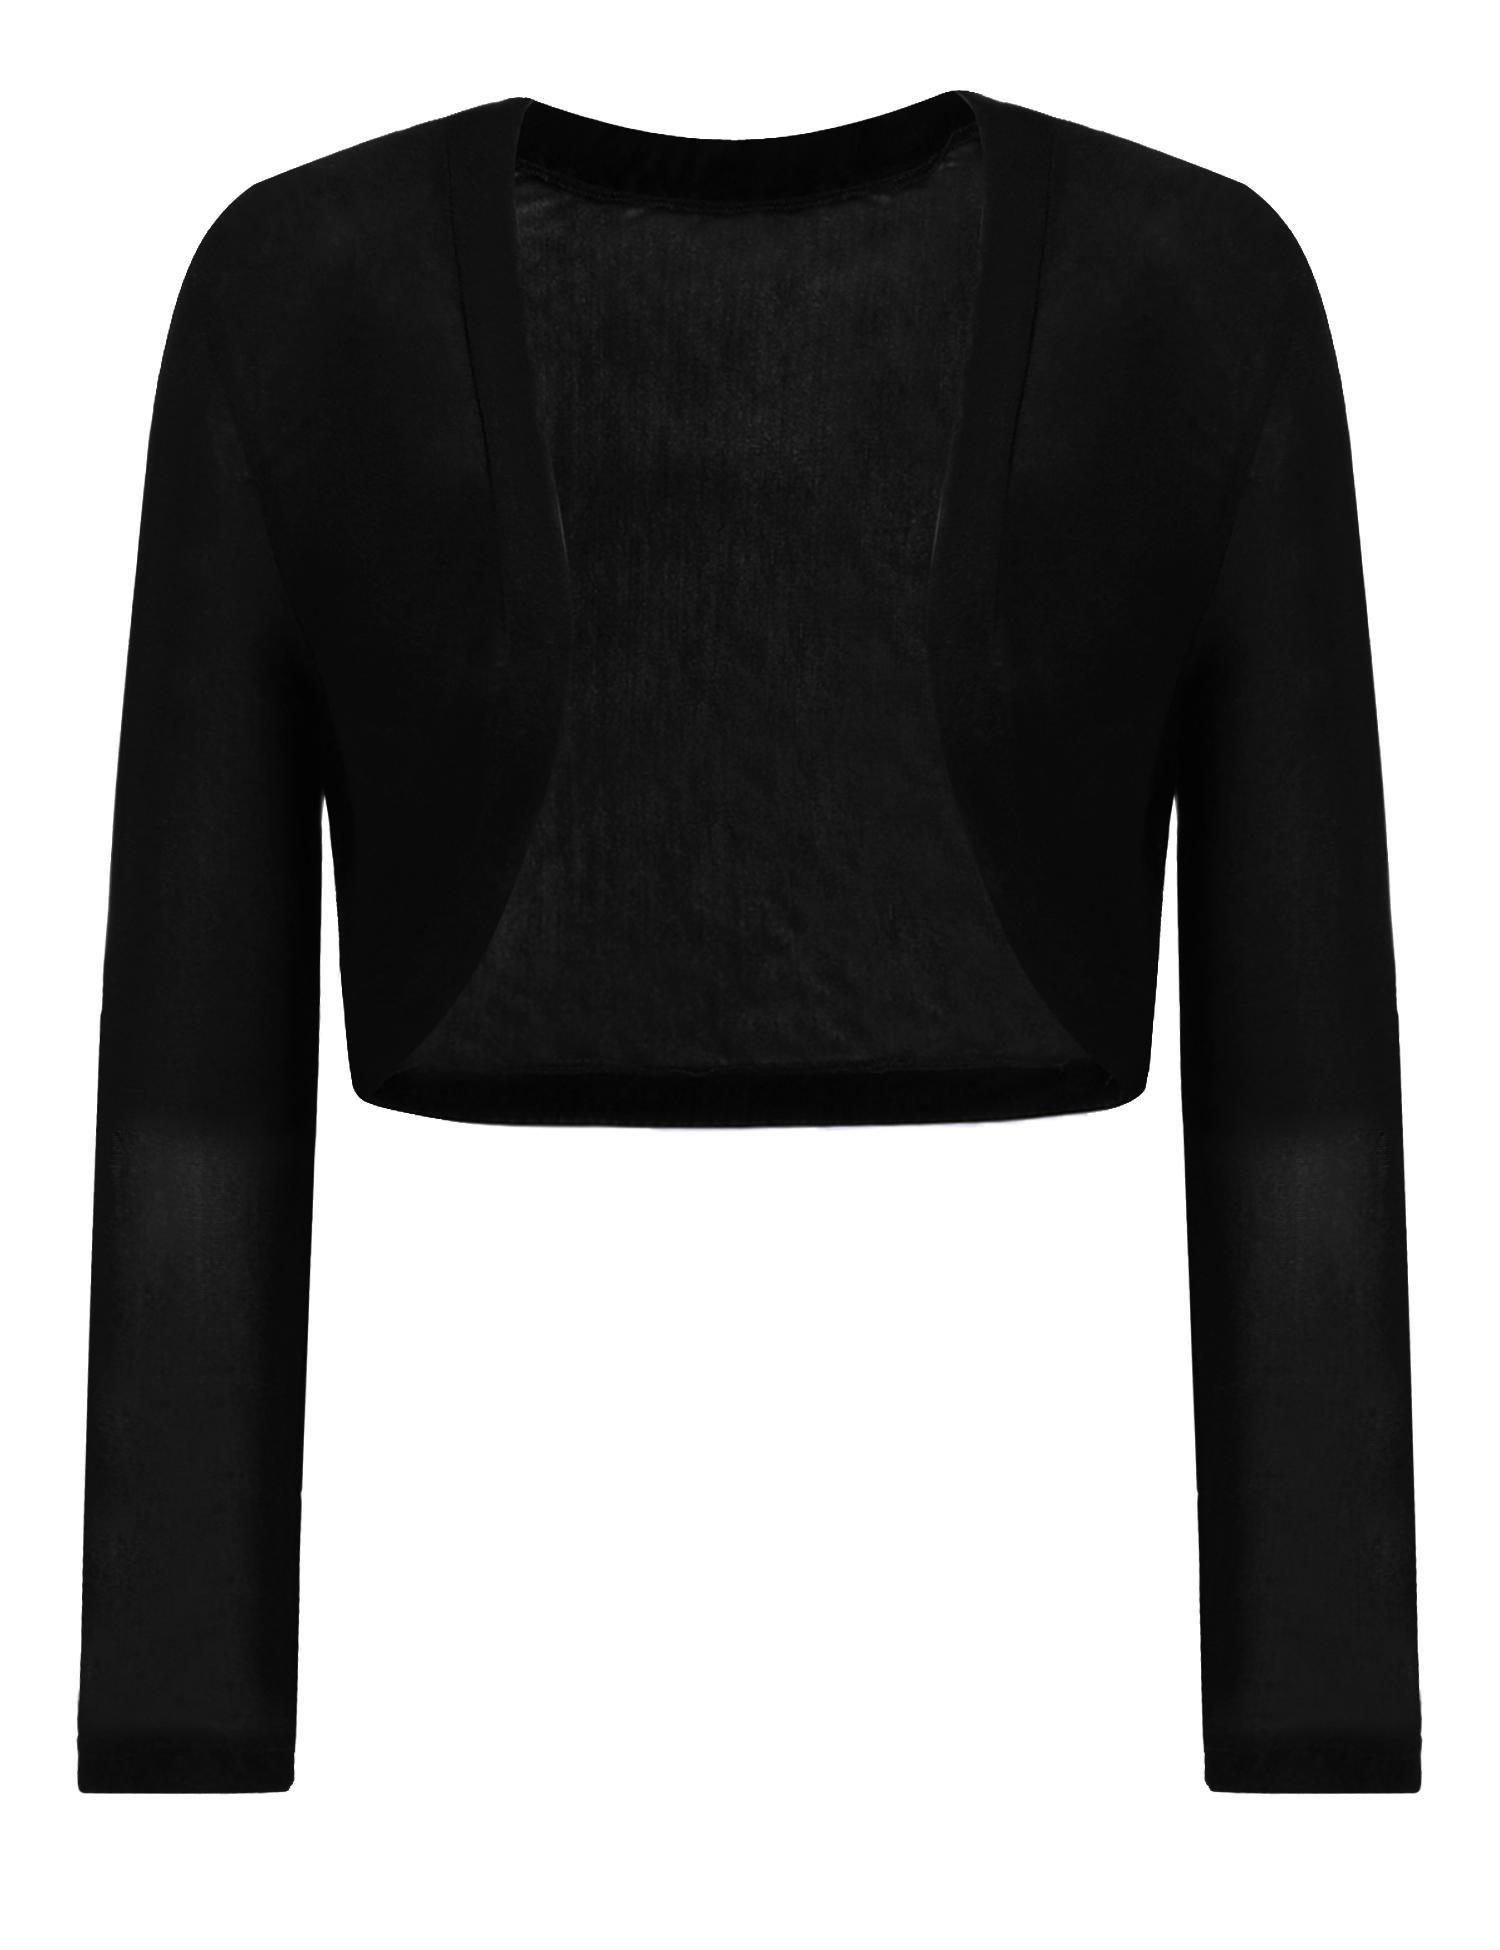 Grabsa Women's Casual Sheer Mesh 3/4 Sleeve Bolero Open Cardigan